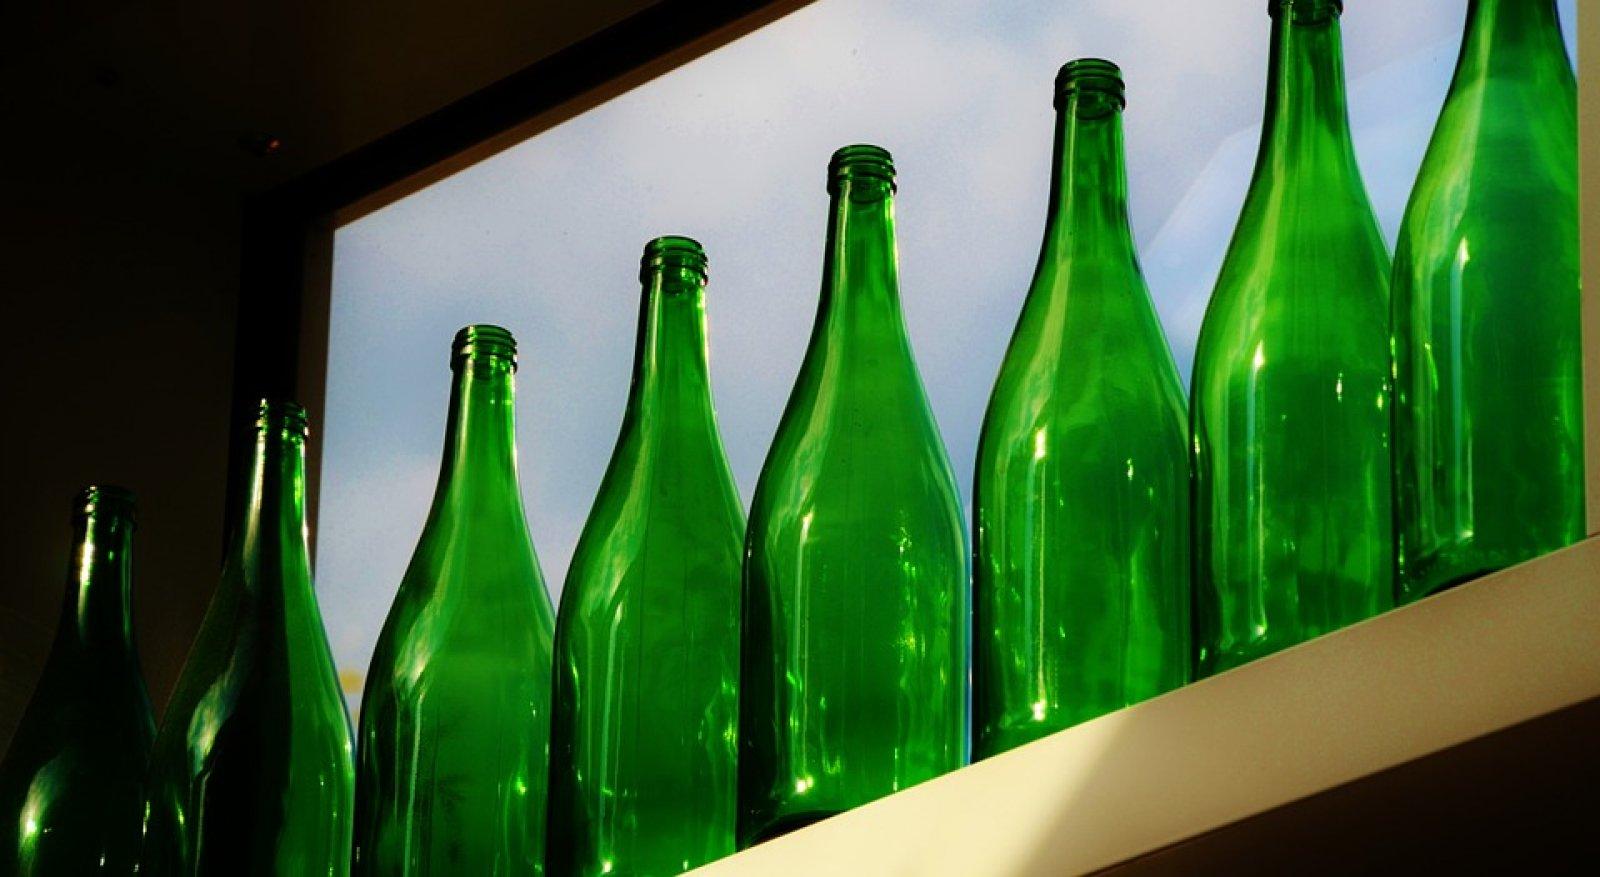 Ampolles de vi buides